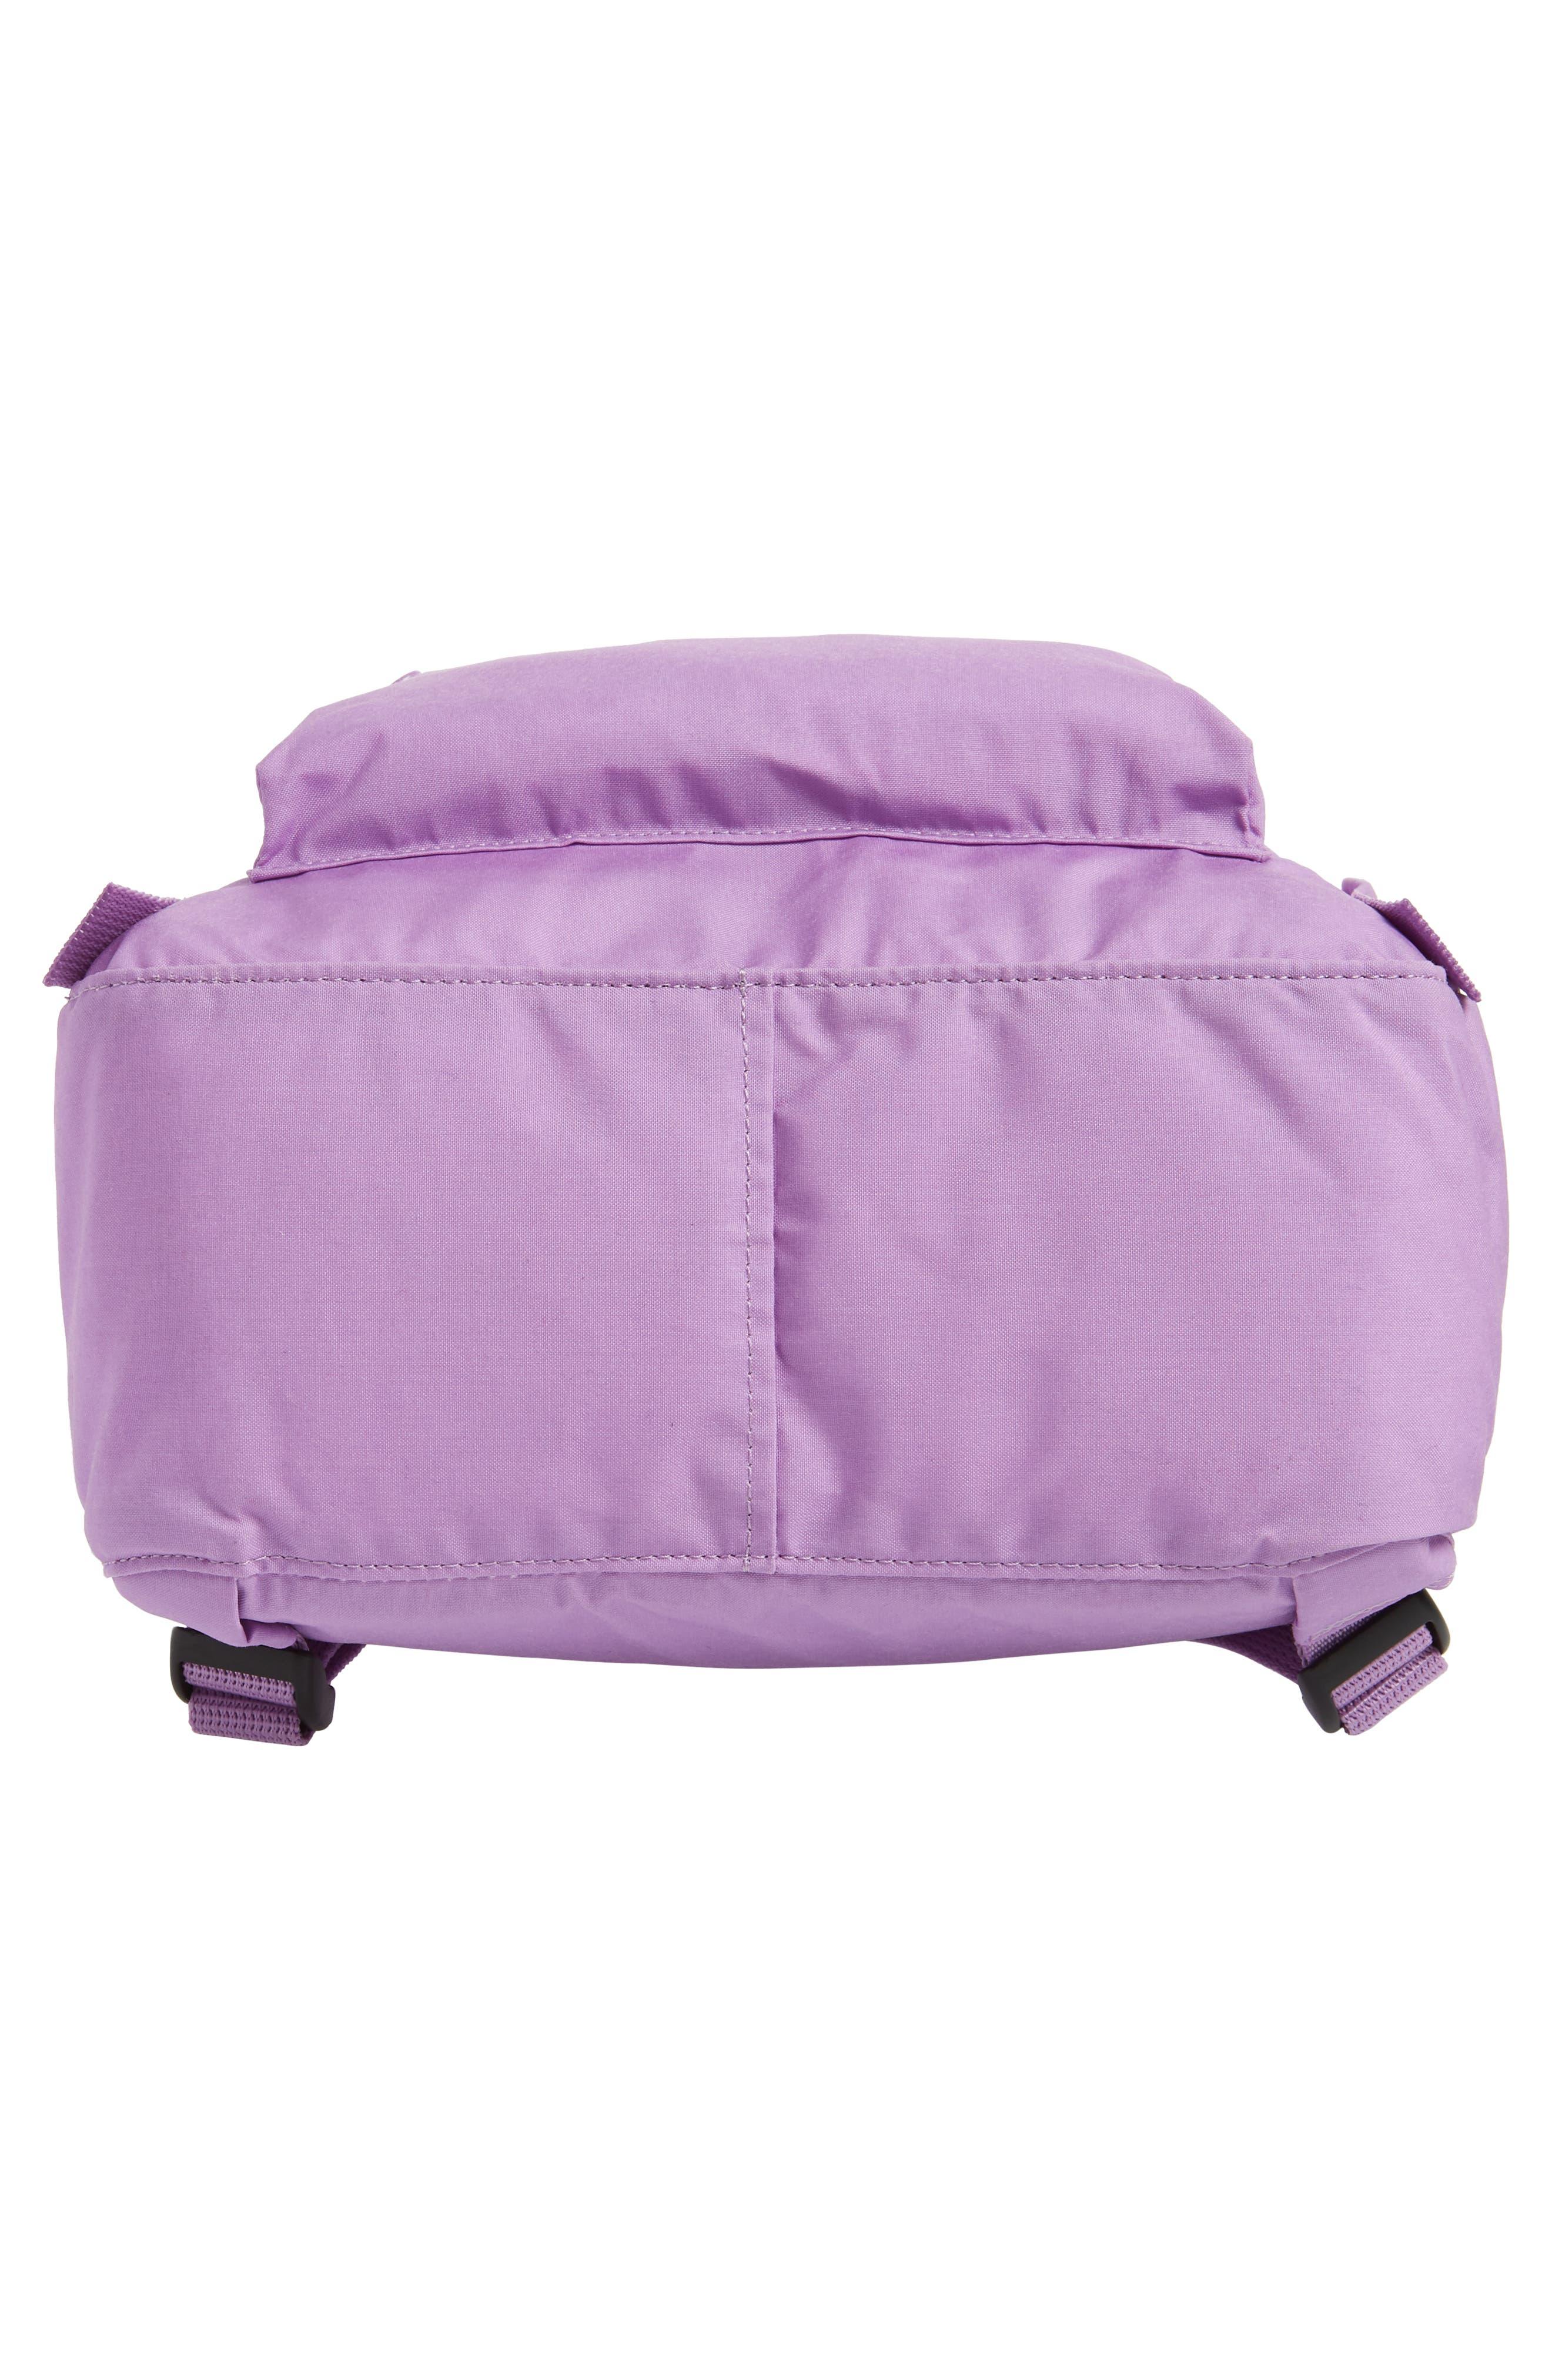 'Kånken' Water Resistant Backpack,                             Alternate thumbnail 314, color,